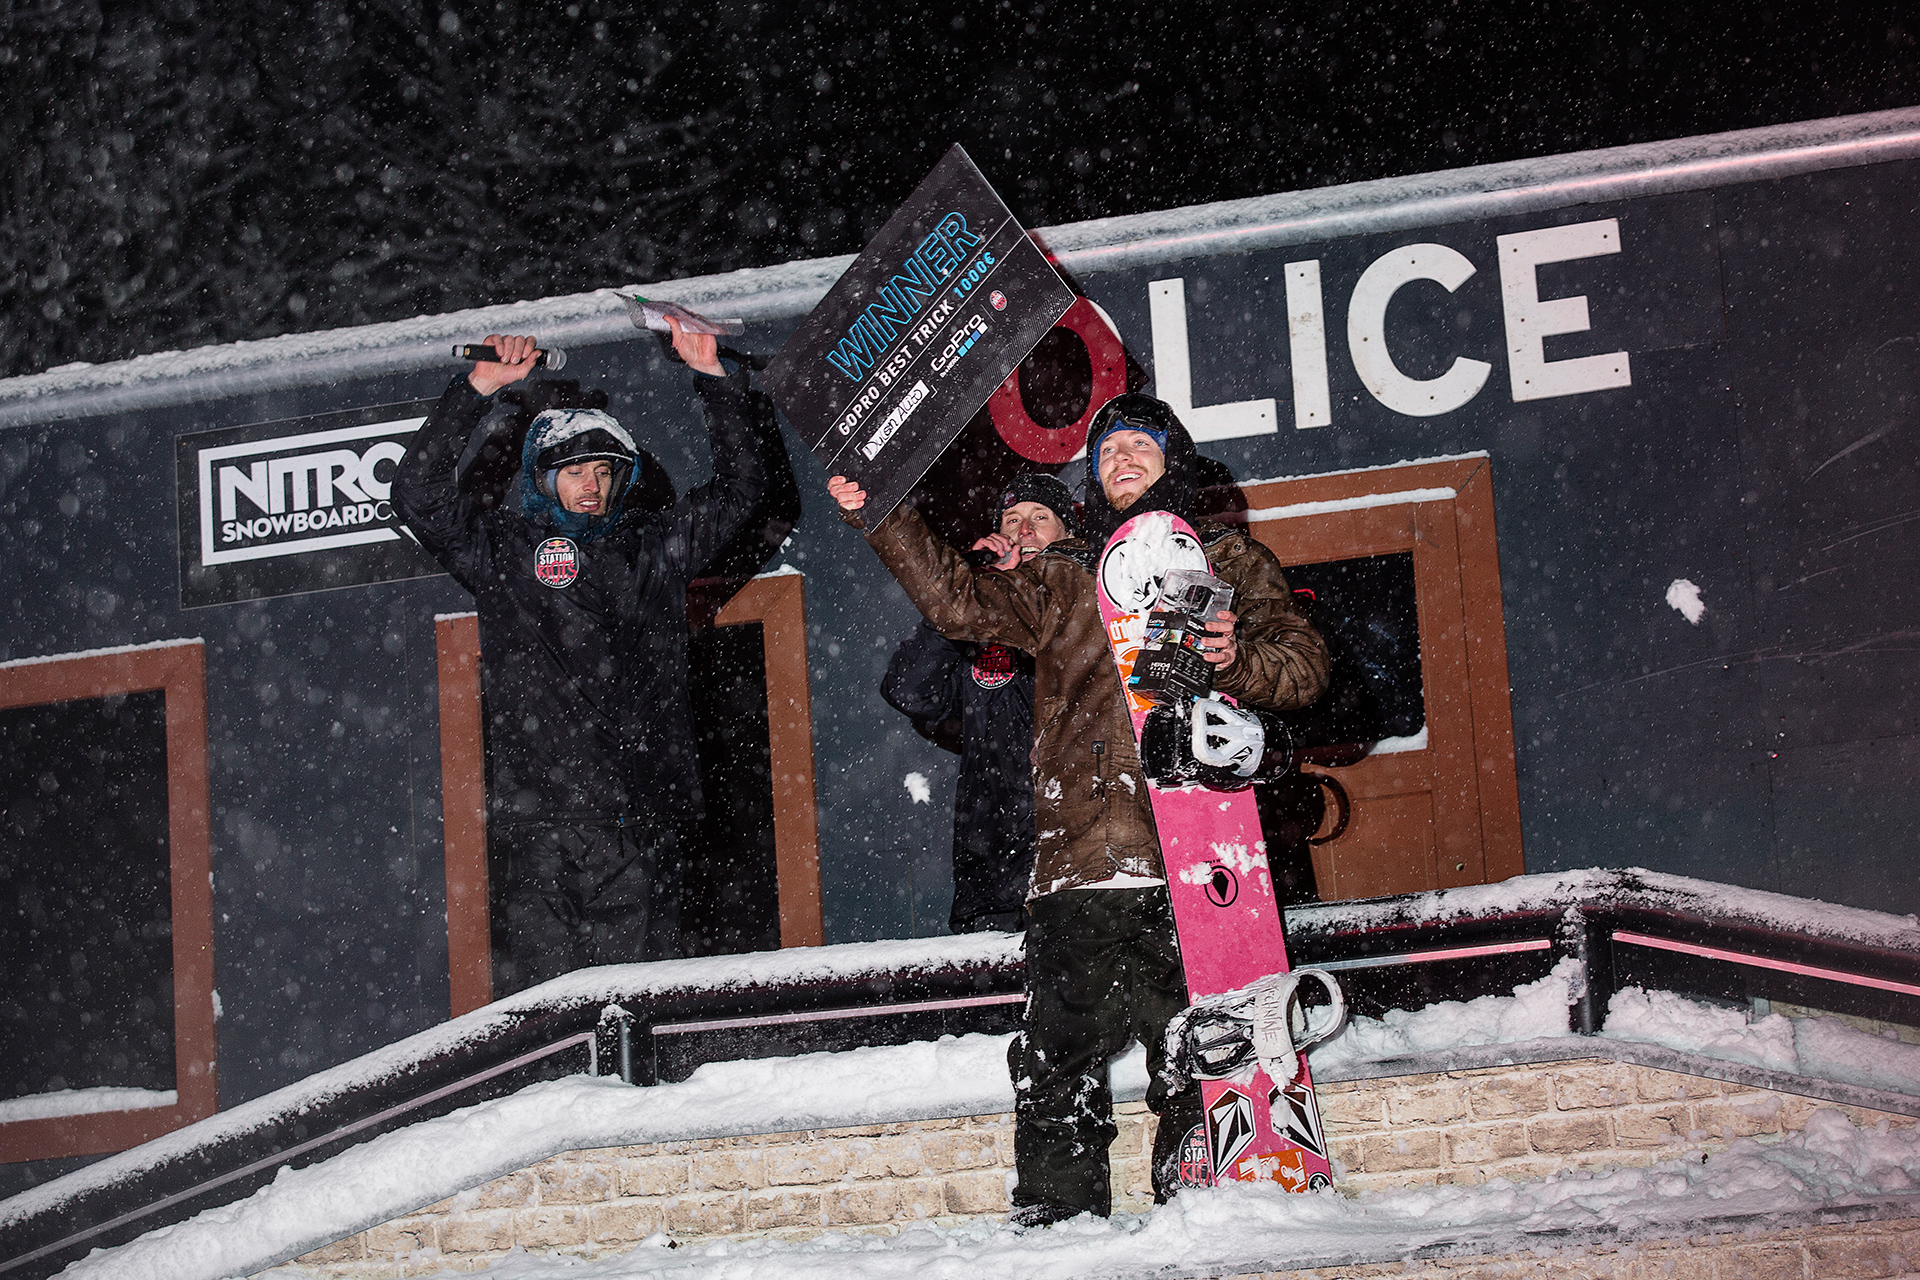 Rider des kriminellsten Tricks an der Police Station: Dylan Alito - Foto: Red Bull Content Pool